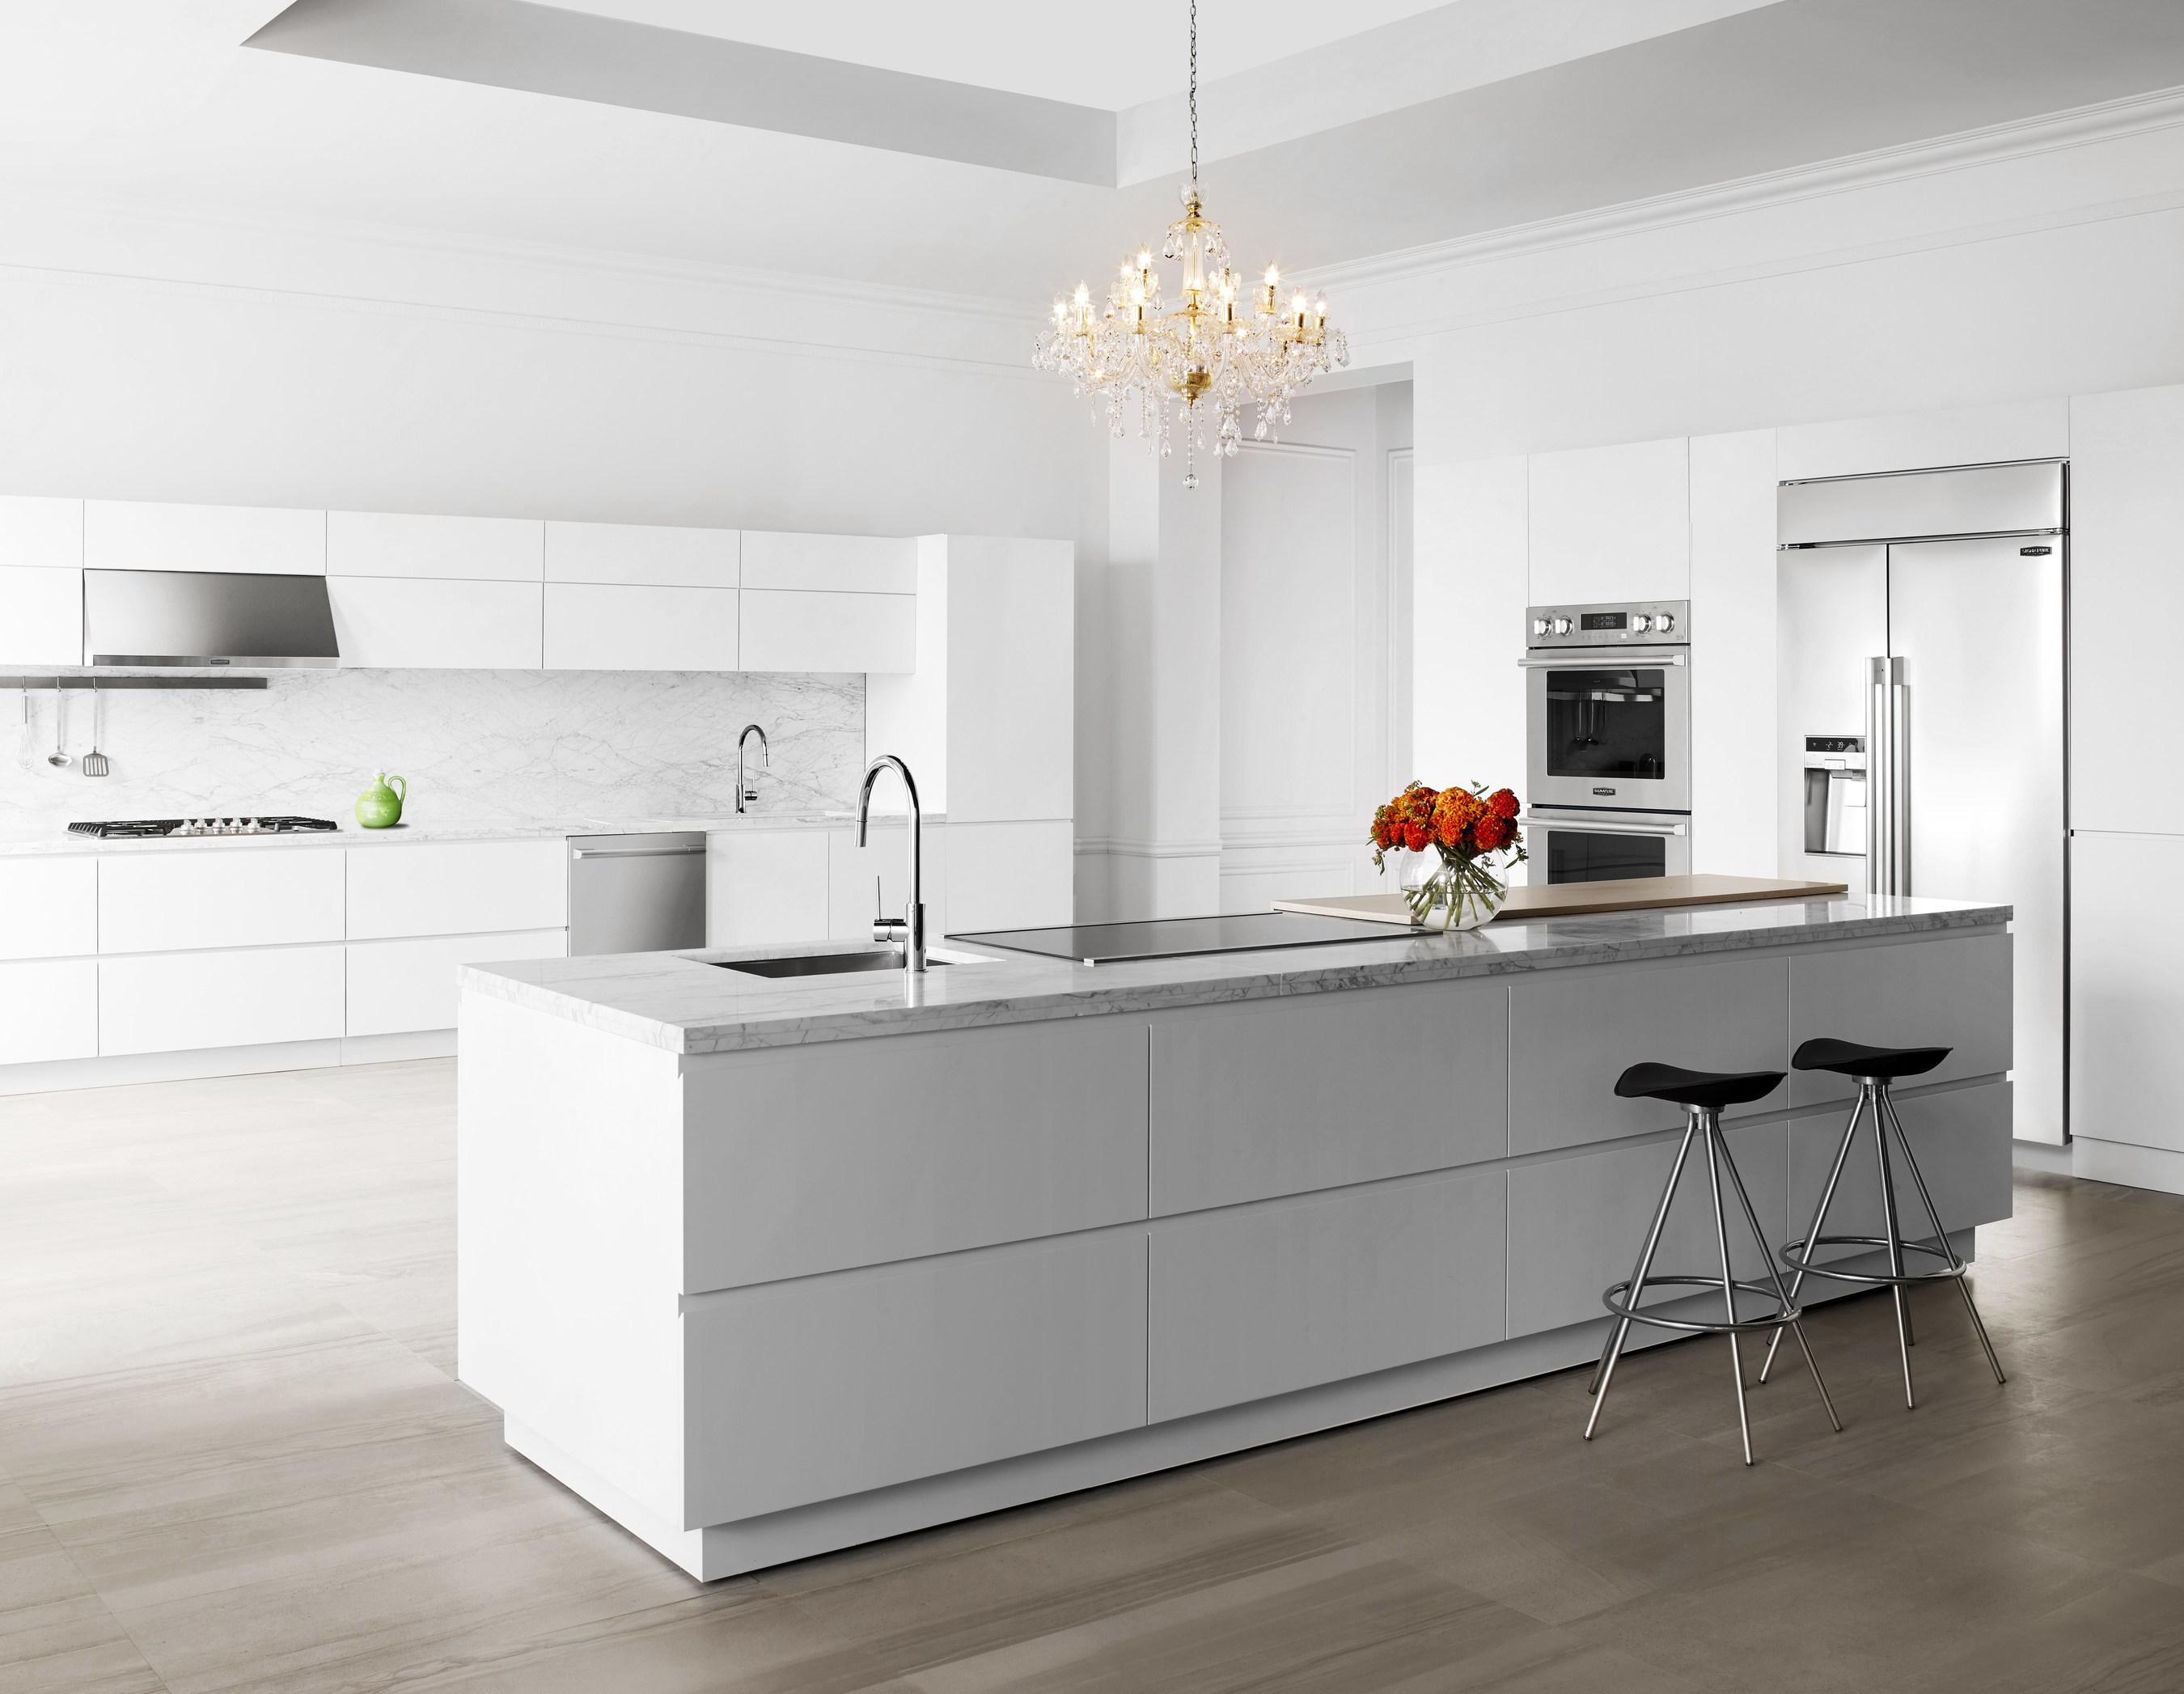 Signature Kitchen Suite, New Super-Premium Appliance Brand, Makes ...